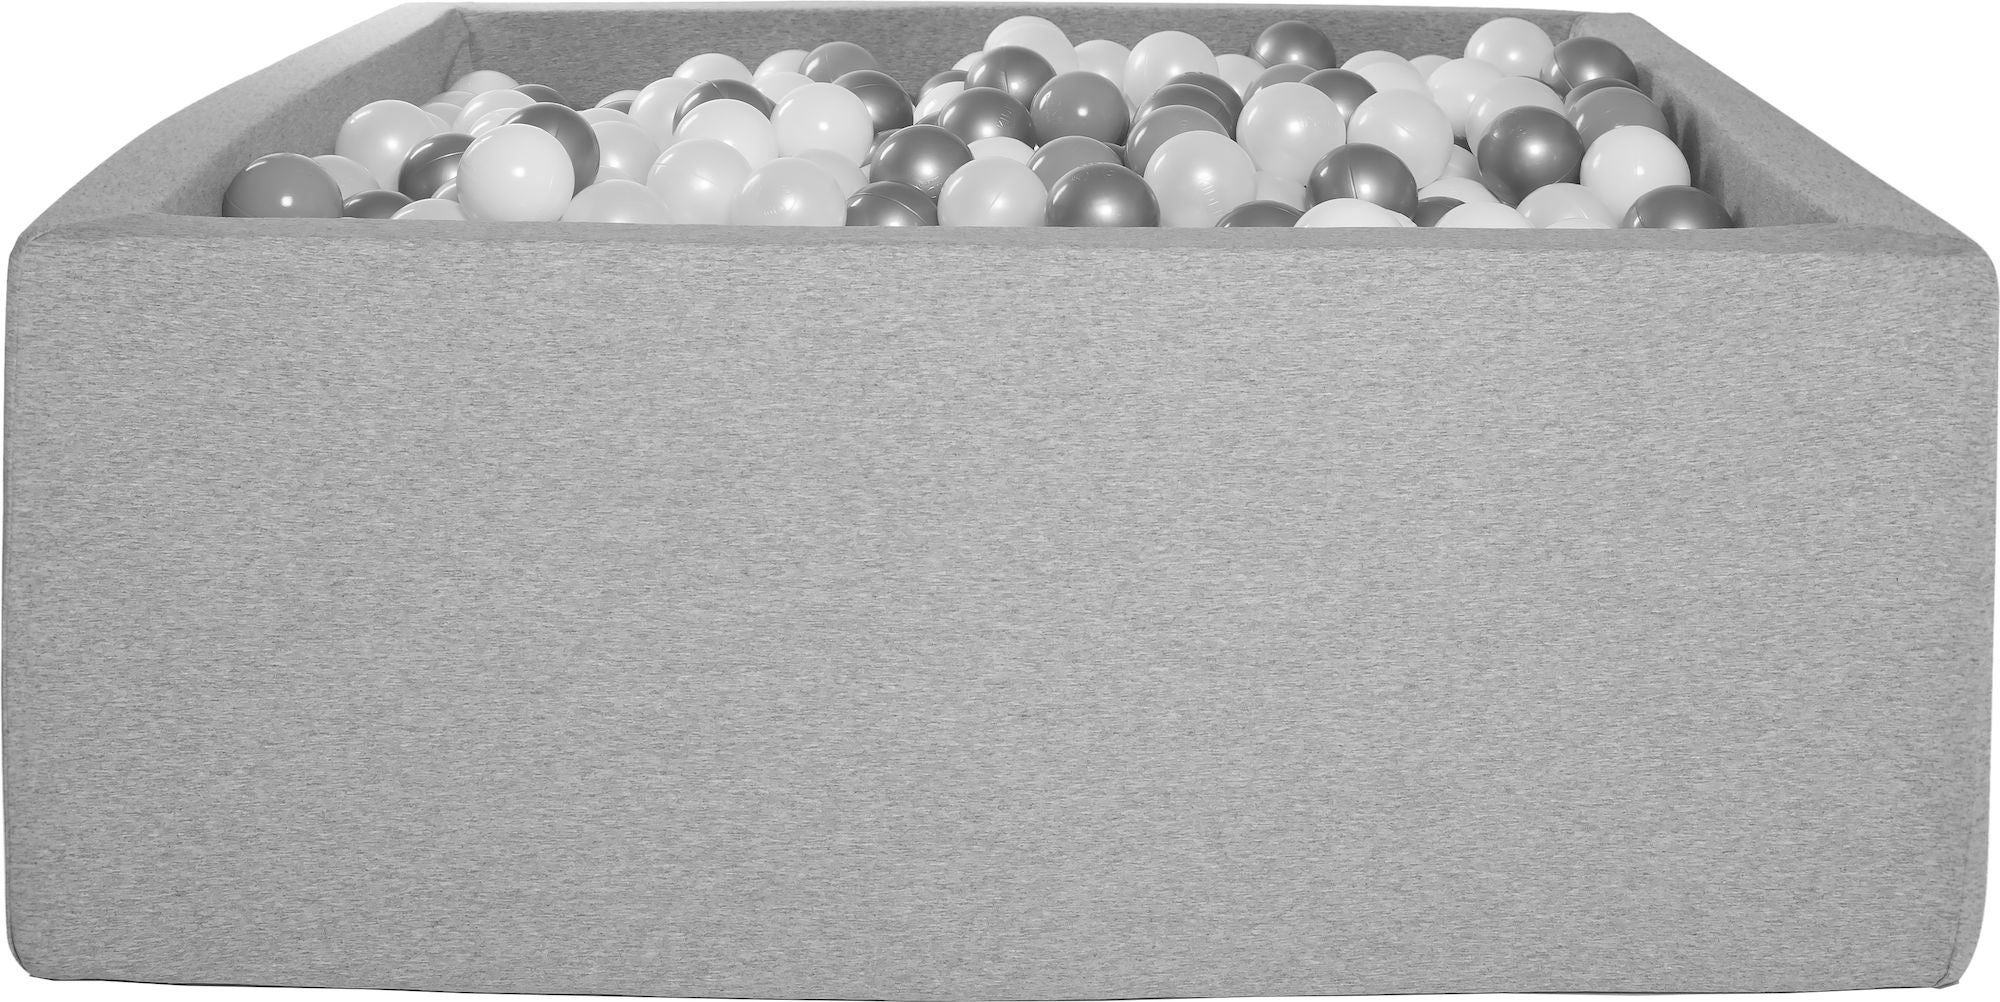 KIDKII Bollhav 90x90, Grey